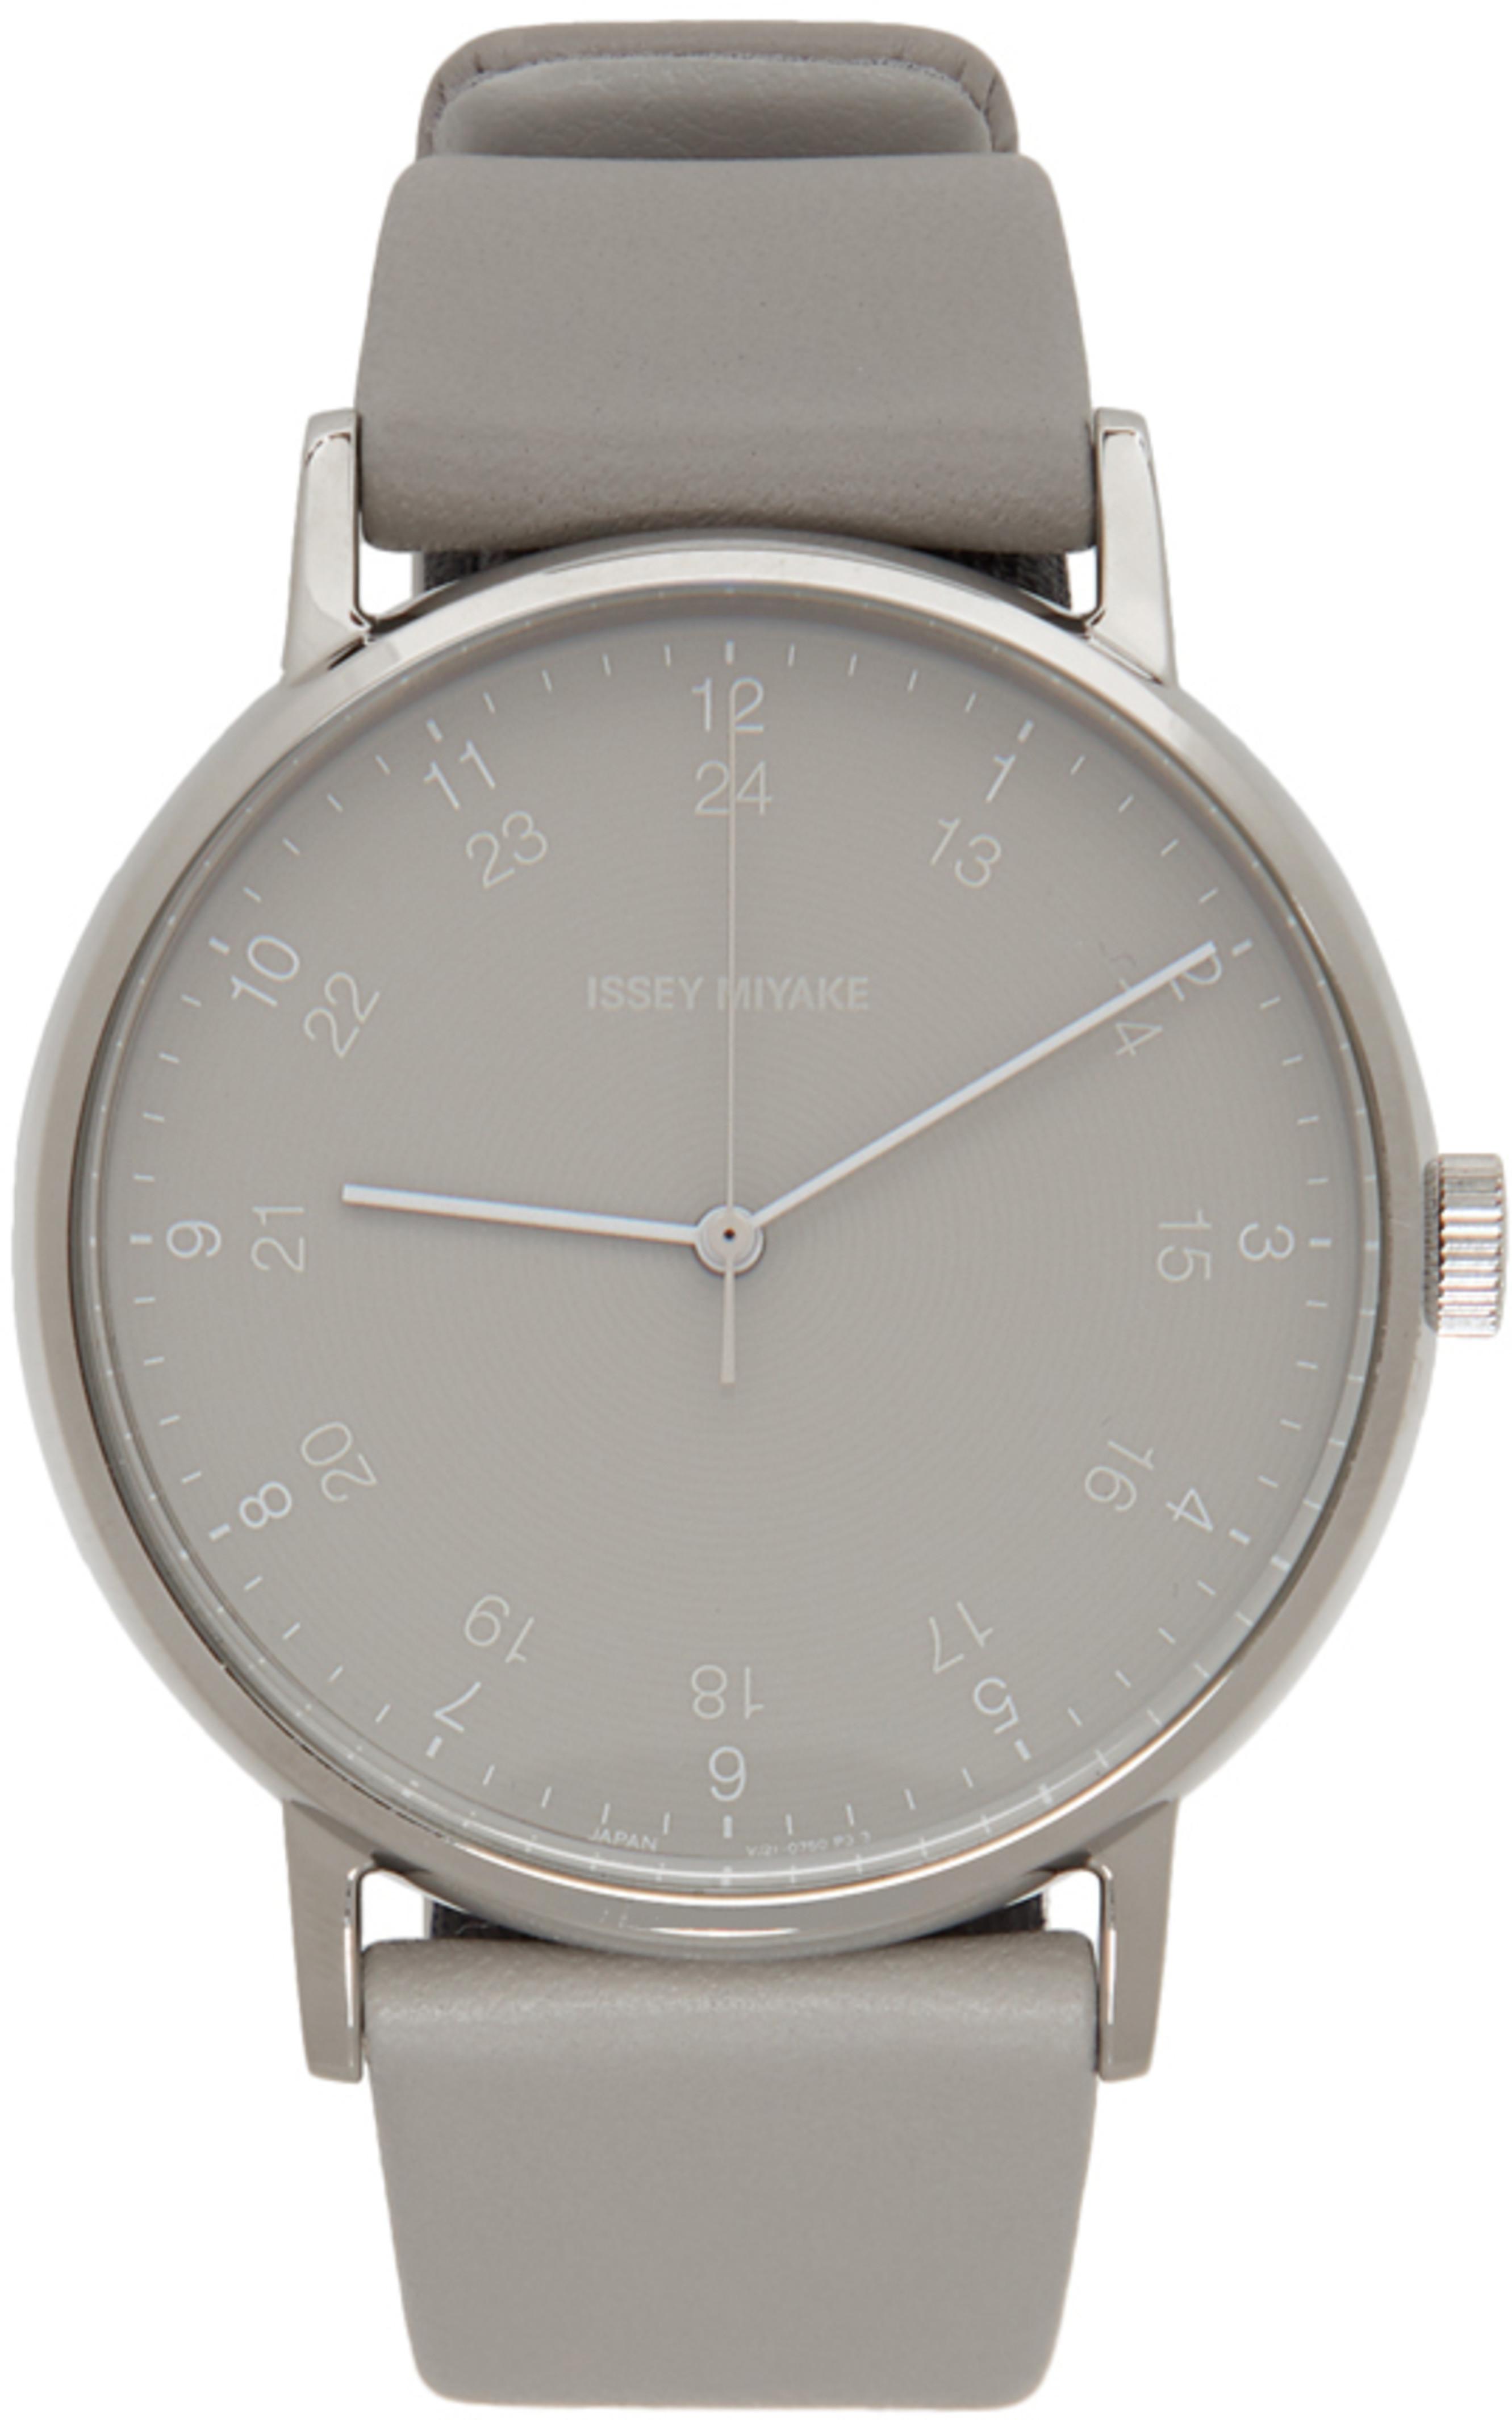 2d92f9fe0c5 Designer watches for Men